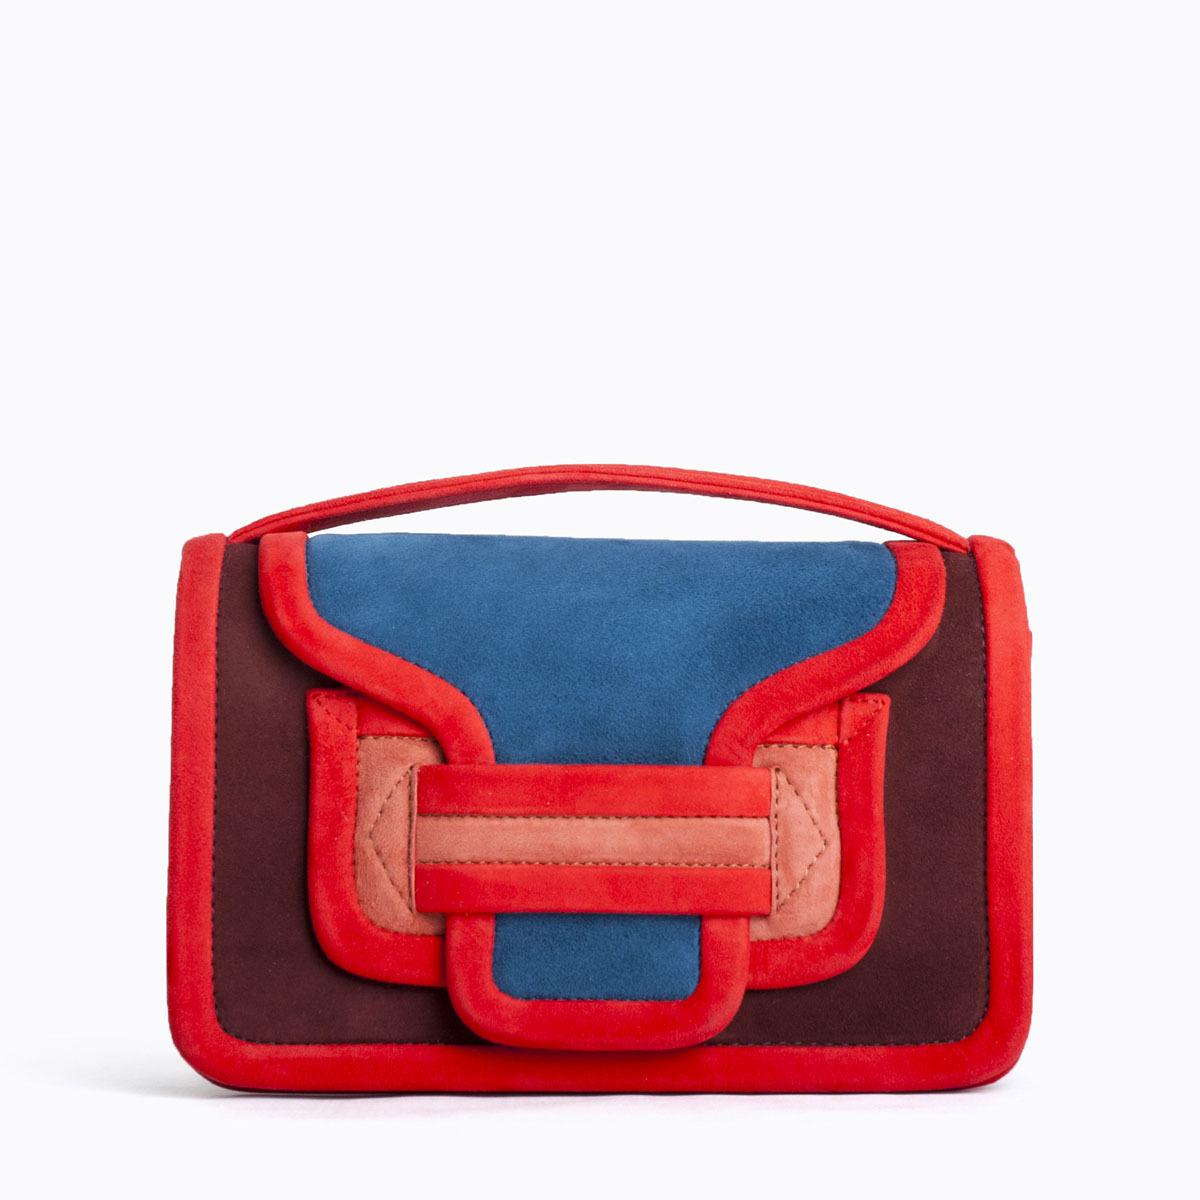 PIERRE HARDY ALPHA BAG   MULTI BLUE RED